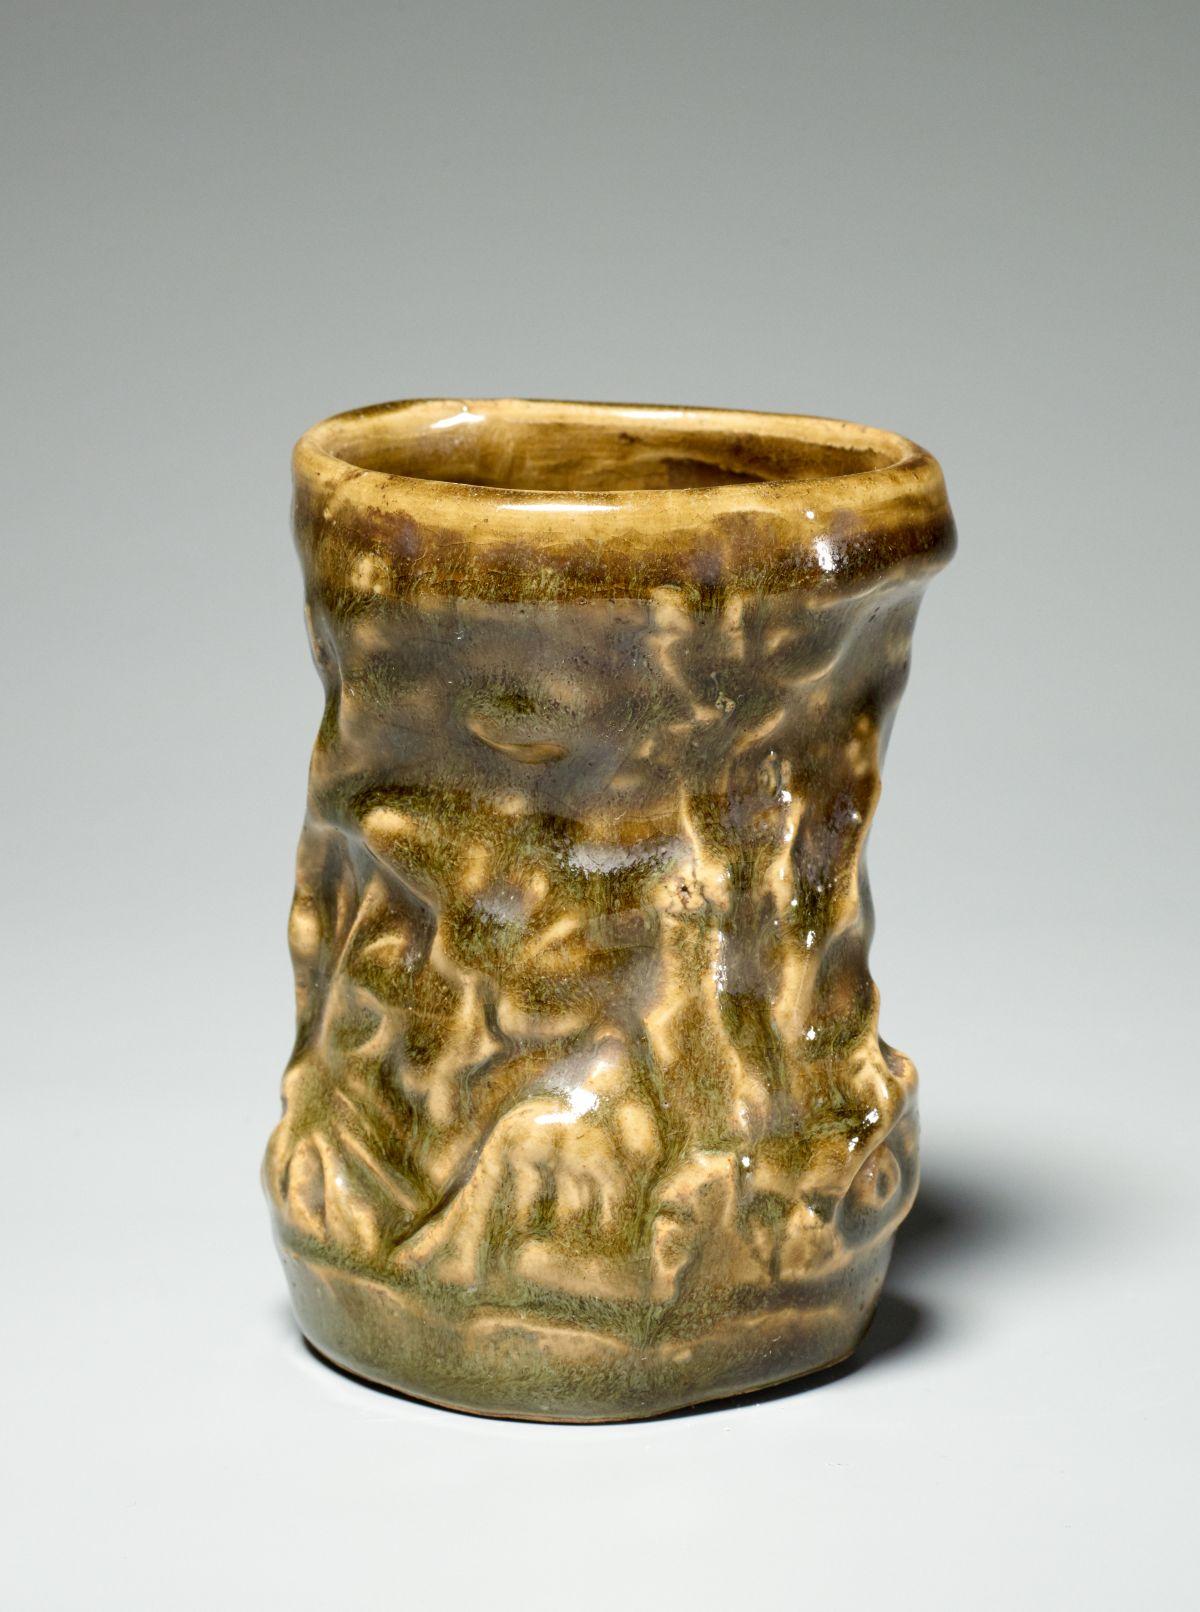 #199 A glazed Oribe cup | Ein glasierter Oribe-Becher Image